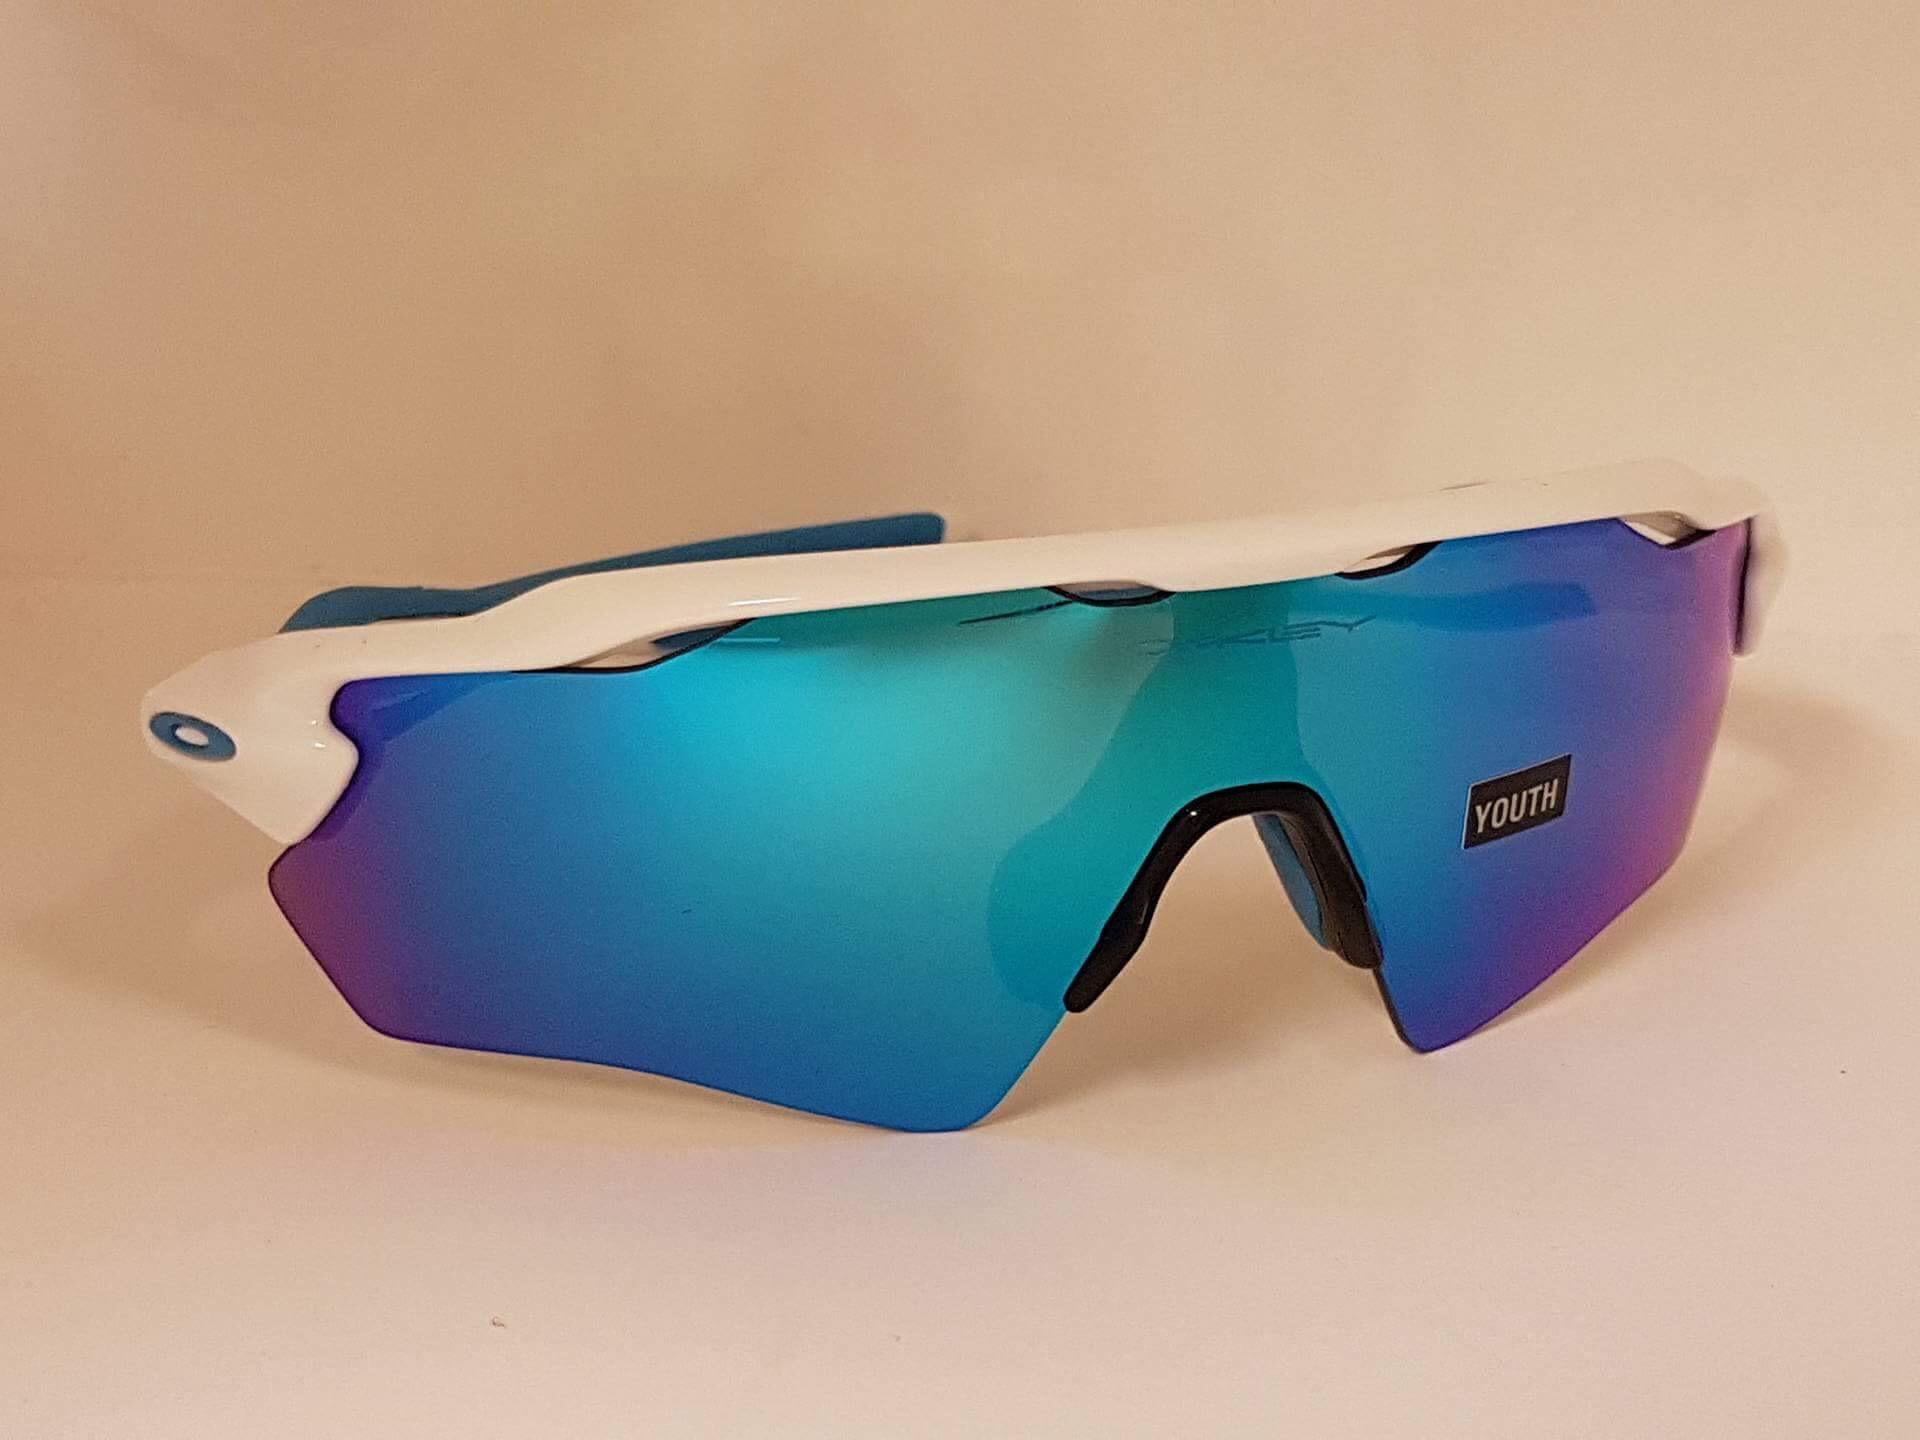 9dafe15731 ... xs path sunglasses oj9001 0131 c9e09 c6cf1  wholesale oakley radar ev  youth 9001 2d4c6 eb5c1